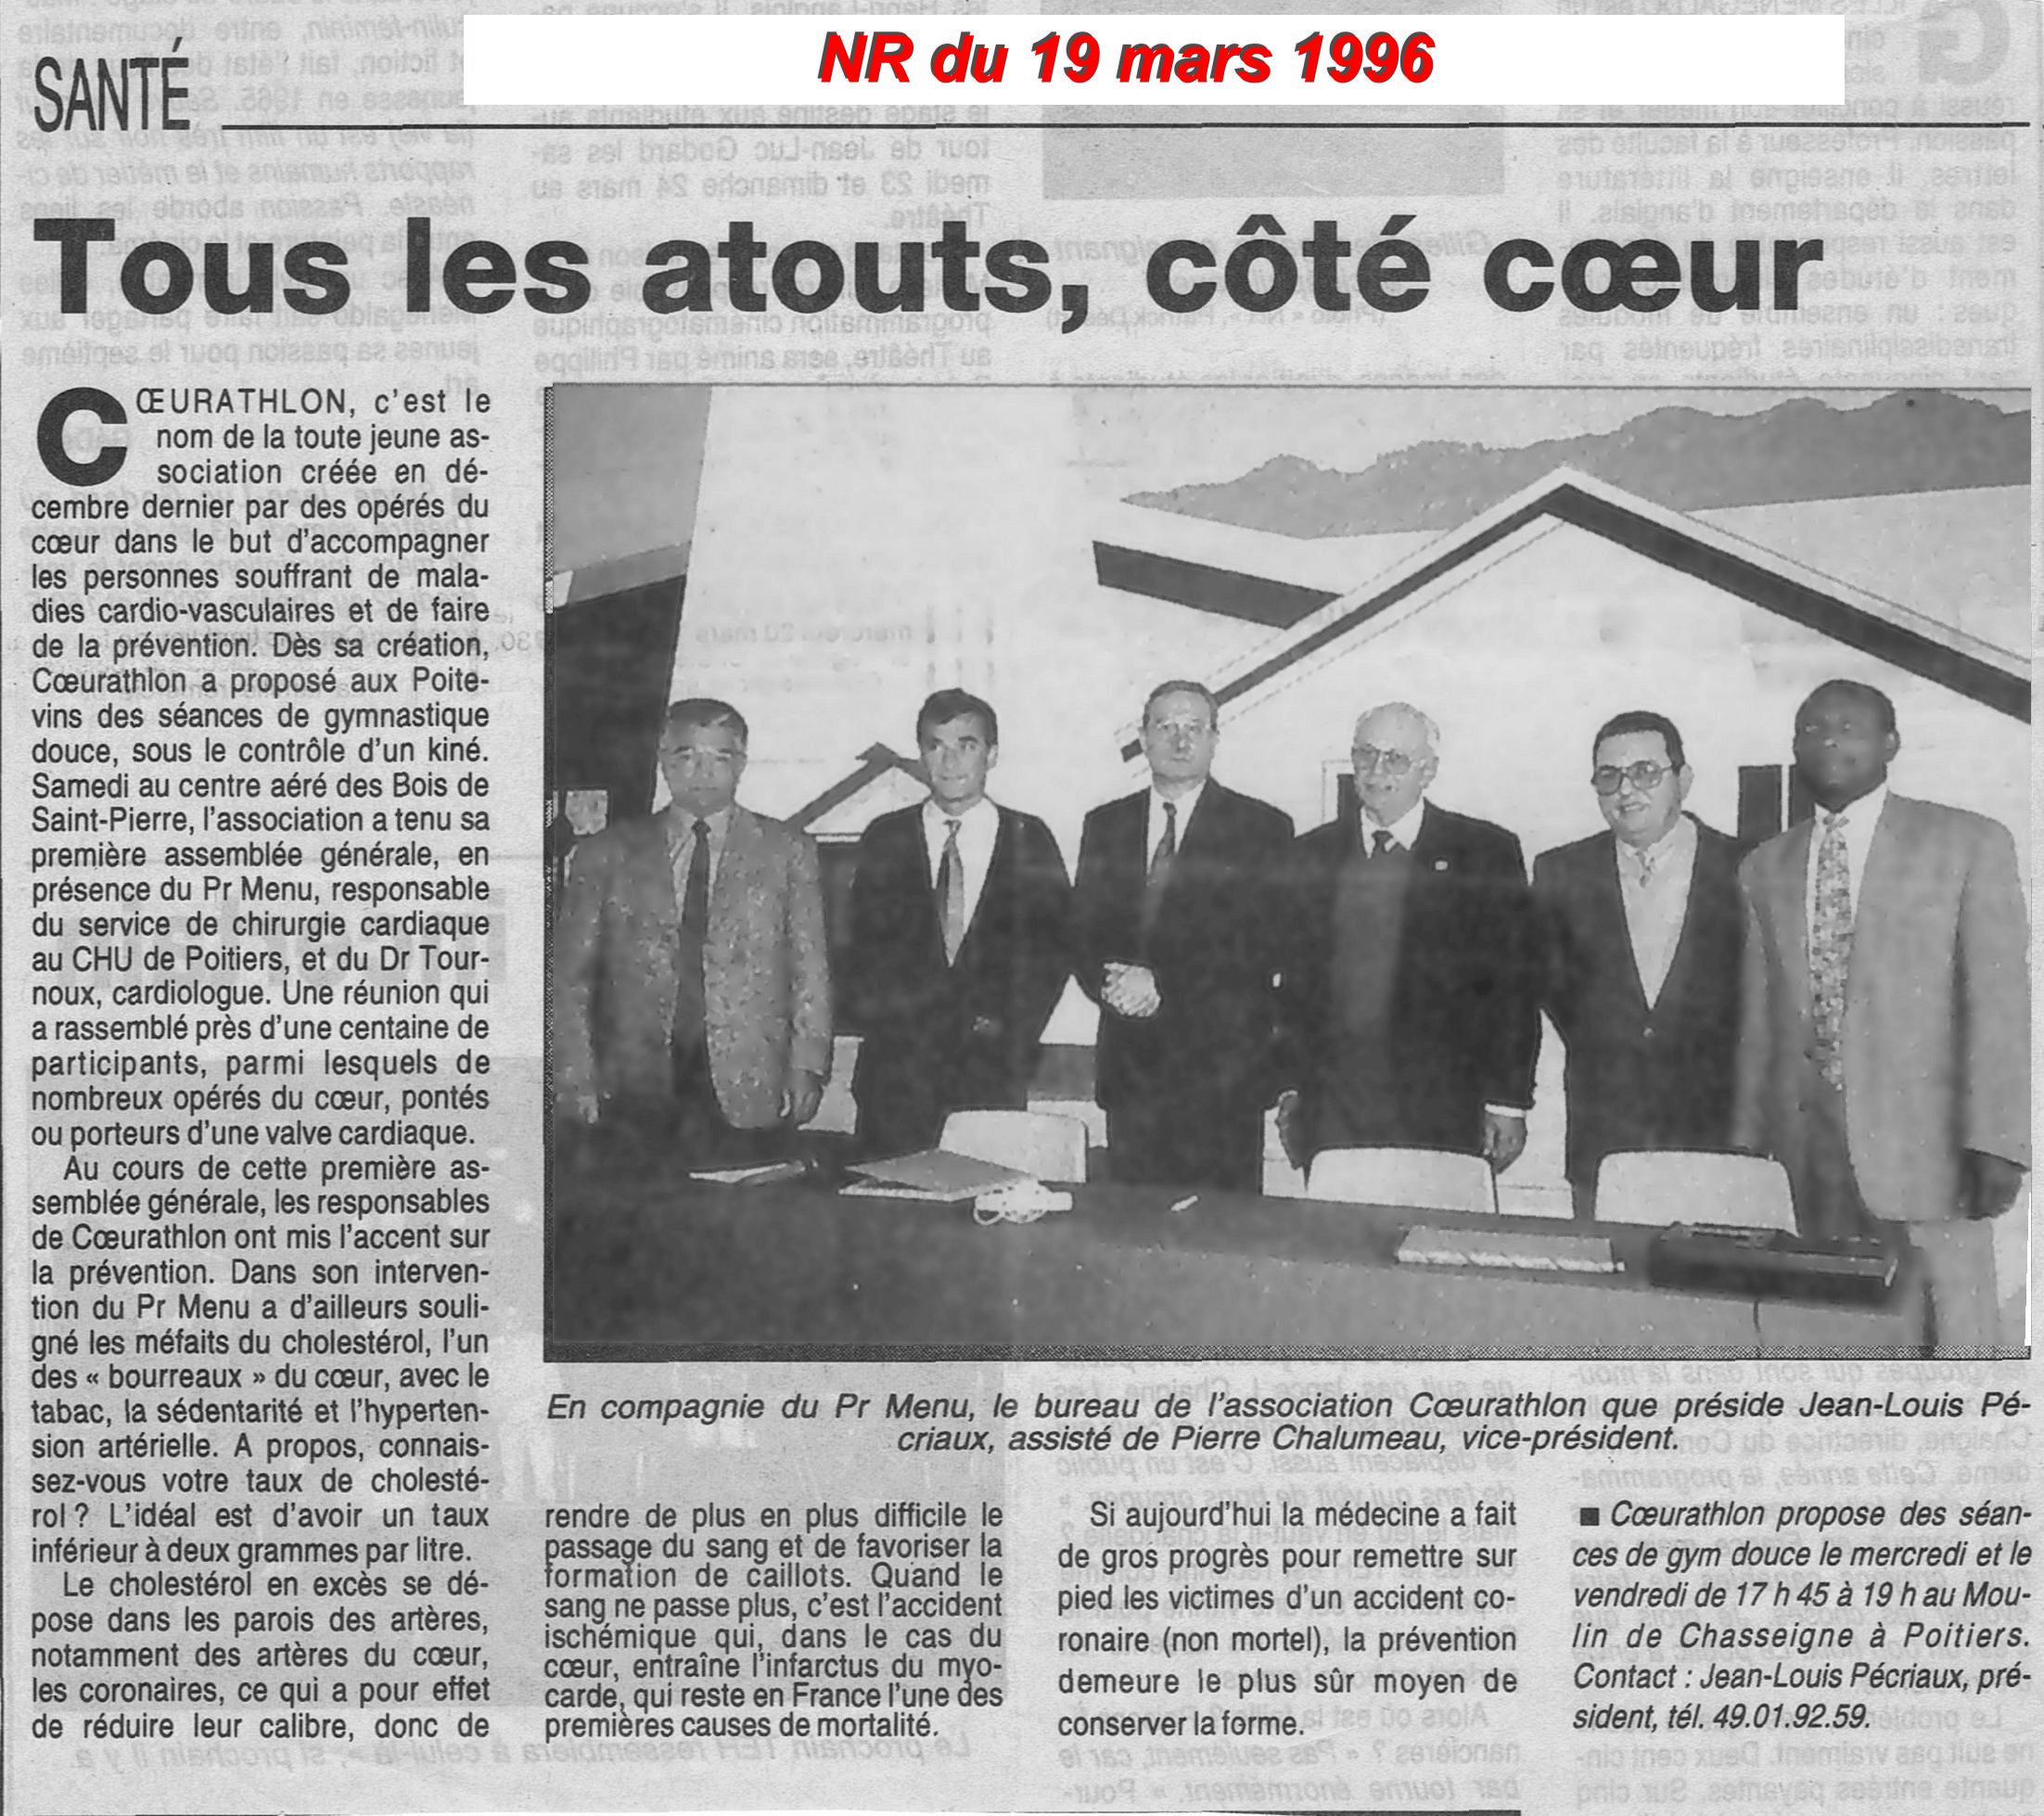 1996_03_19_nr_coeurathlon-pour-tous